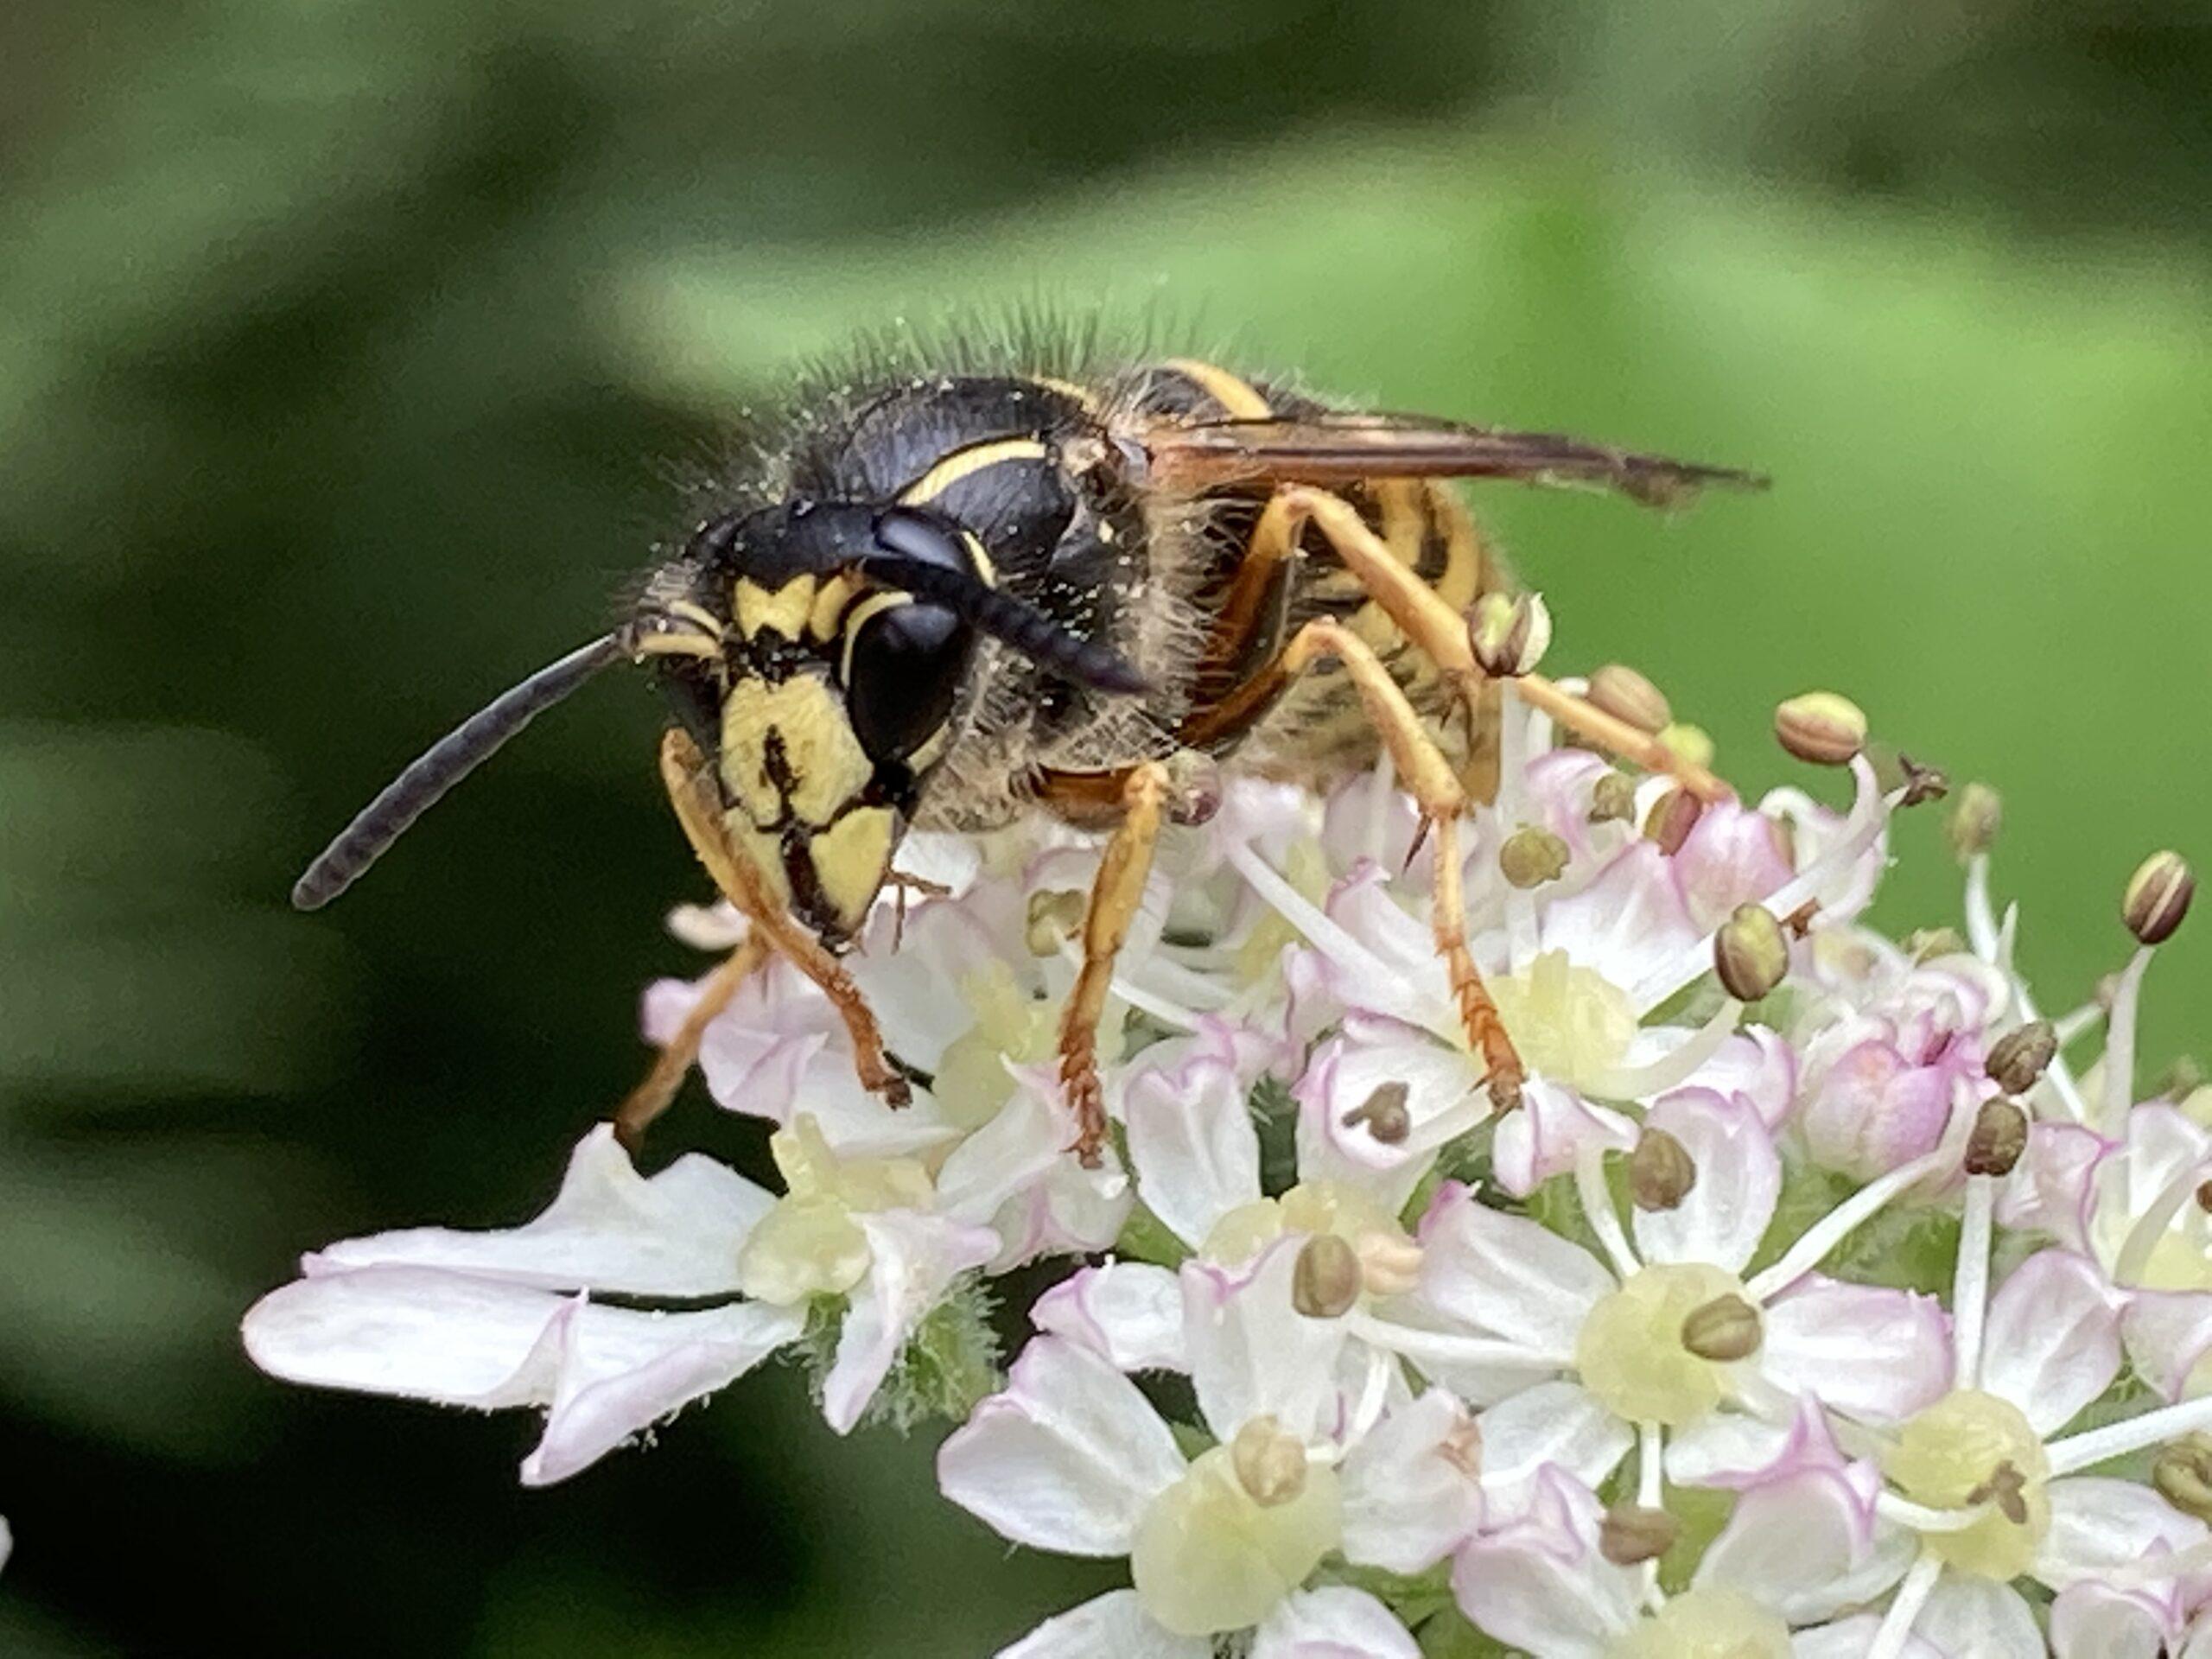 'Saxon wasp' Dolichovespula saxonica